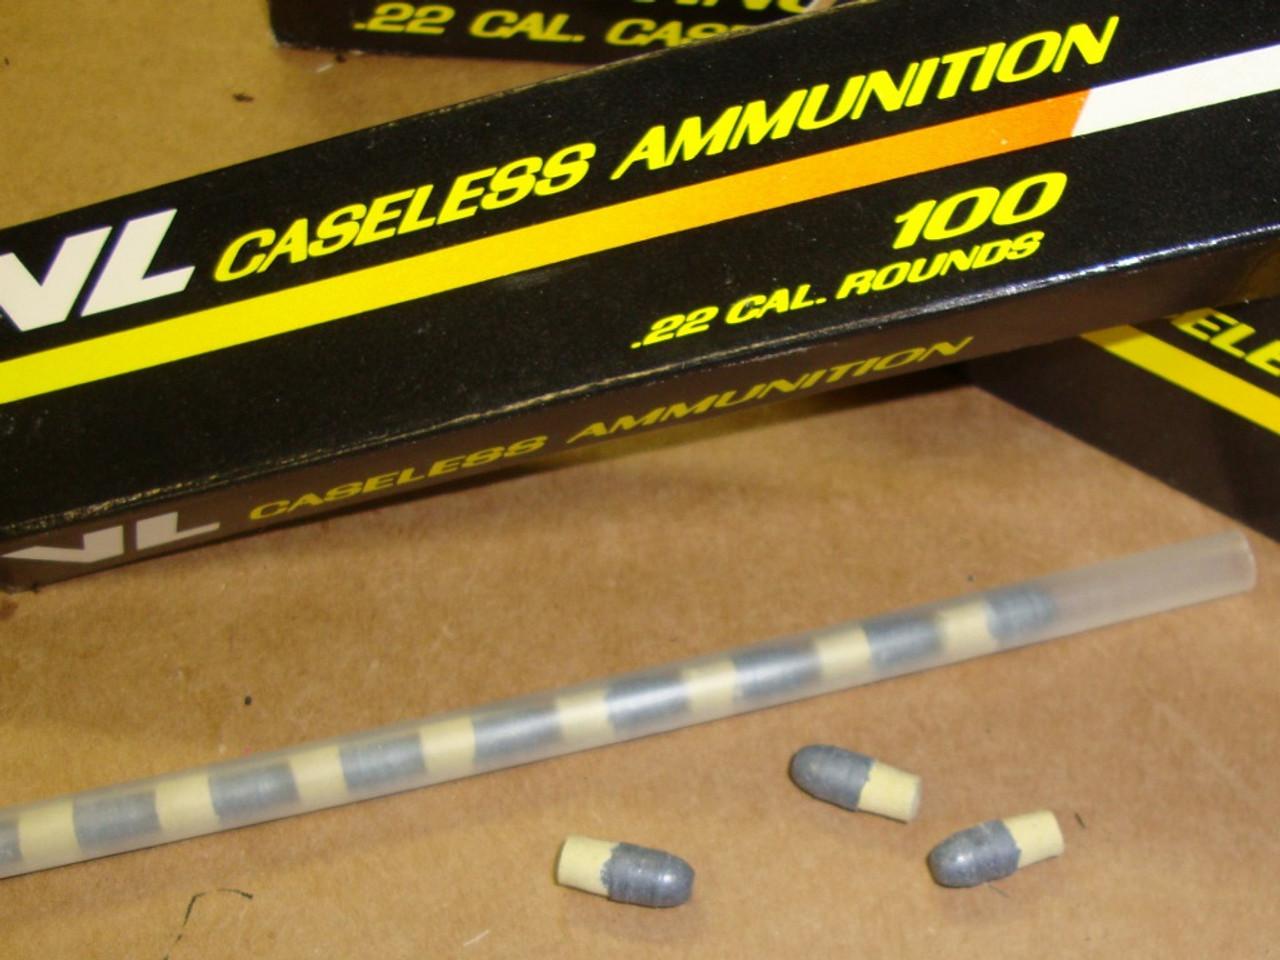 Daisy Heddon VL .22 Caseless Ammunition 100rd Box